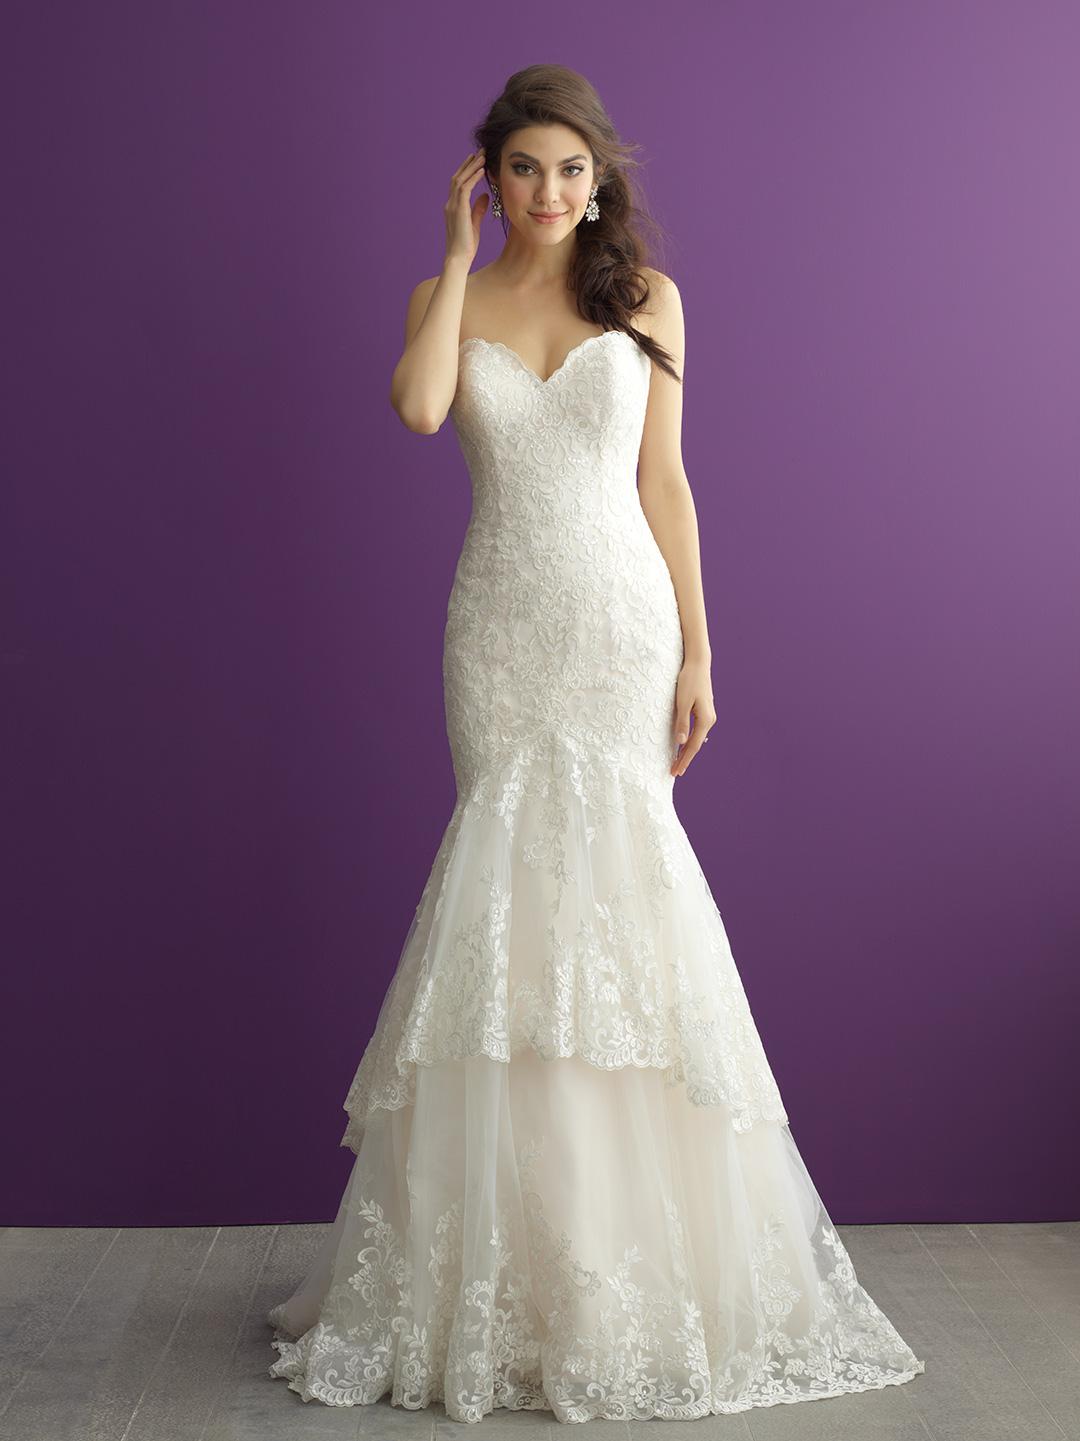 4c004b6ff0 Wedding Dresses | Bridal & Bridesmaid, Formal Gowns | Allure Bridals